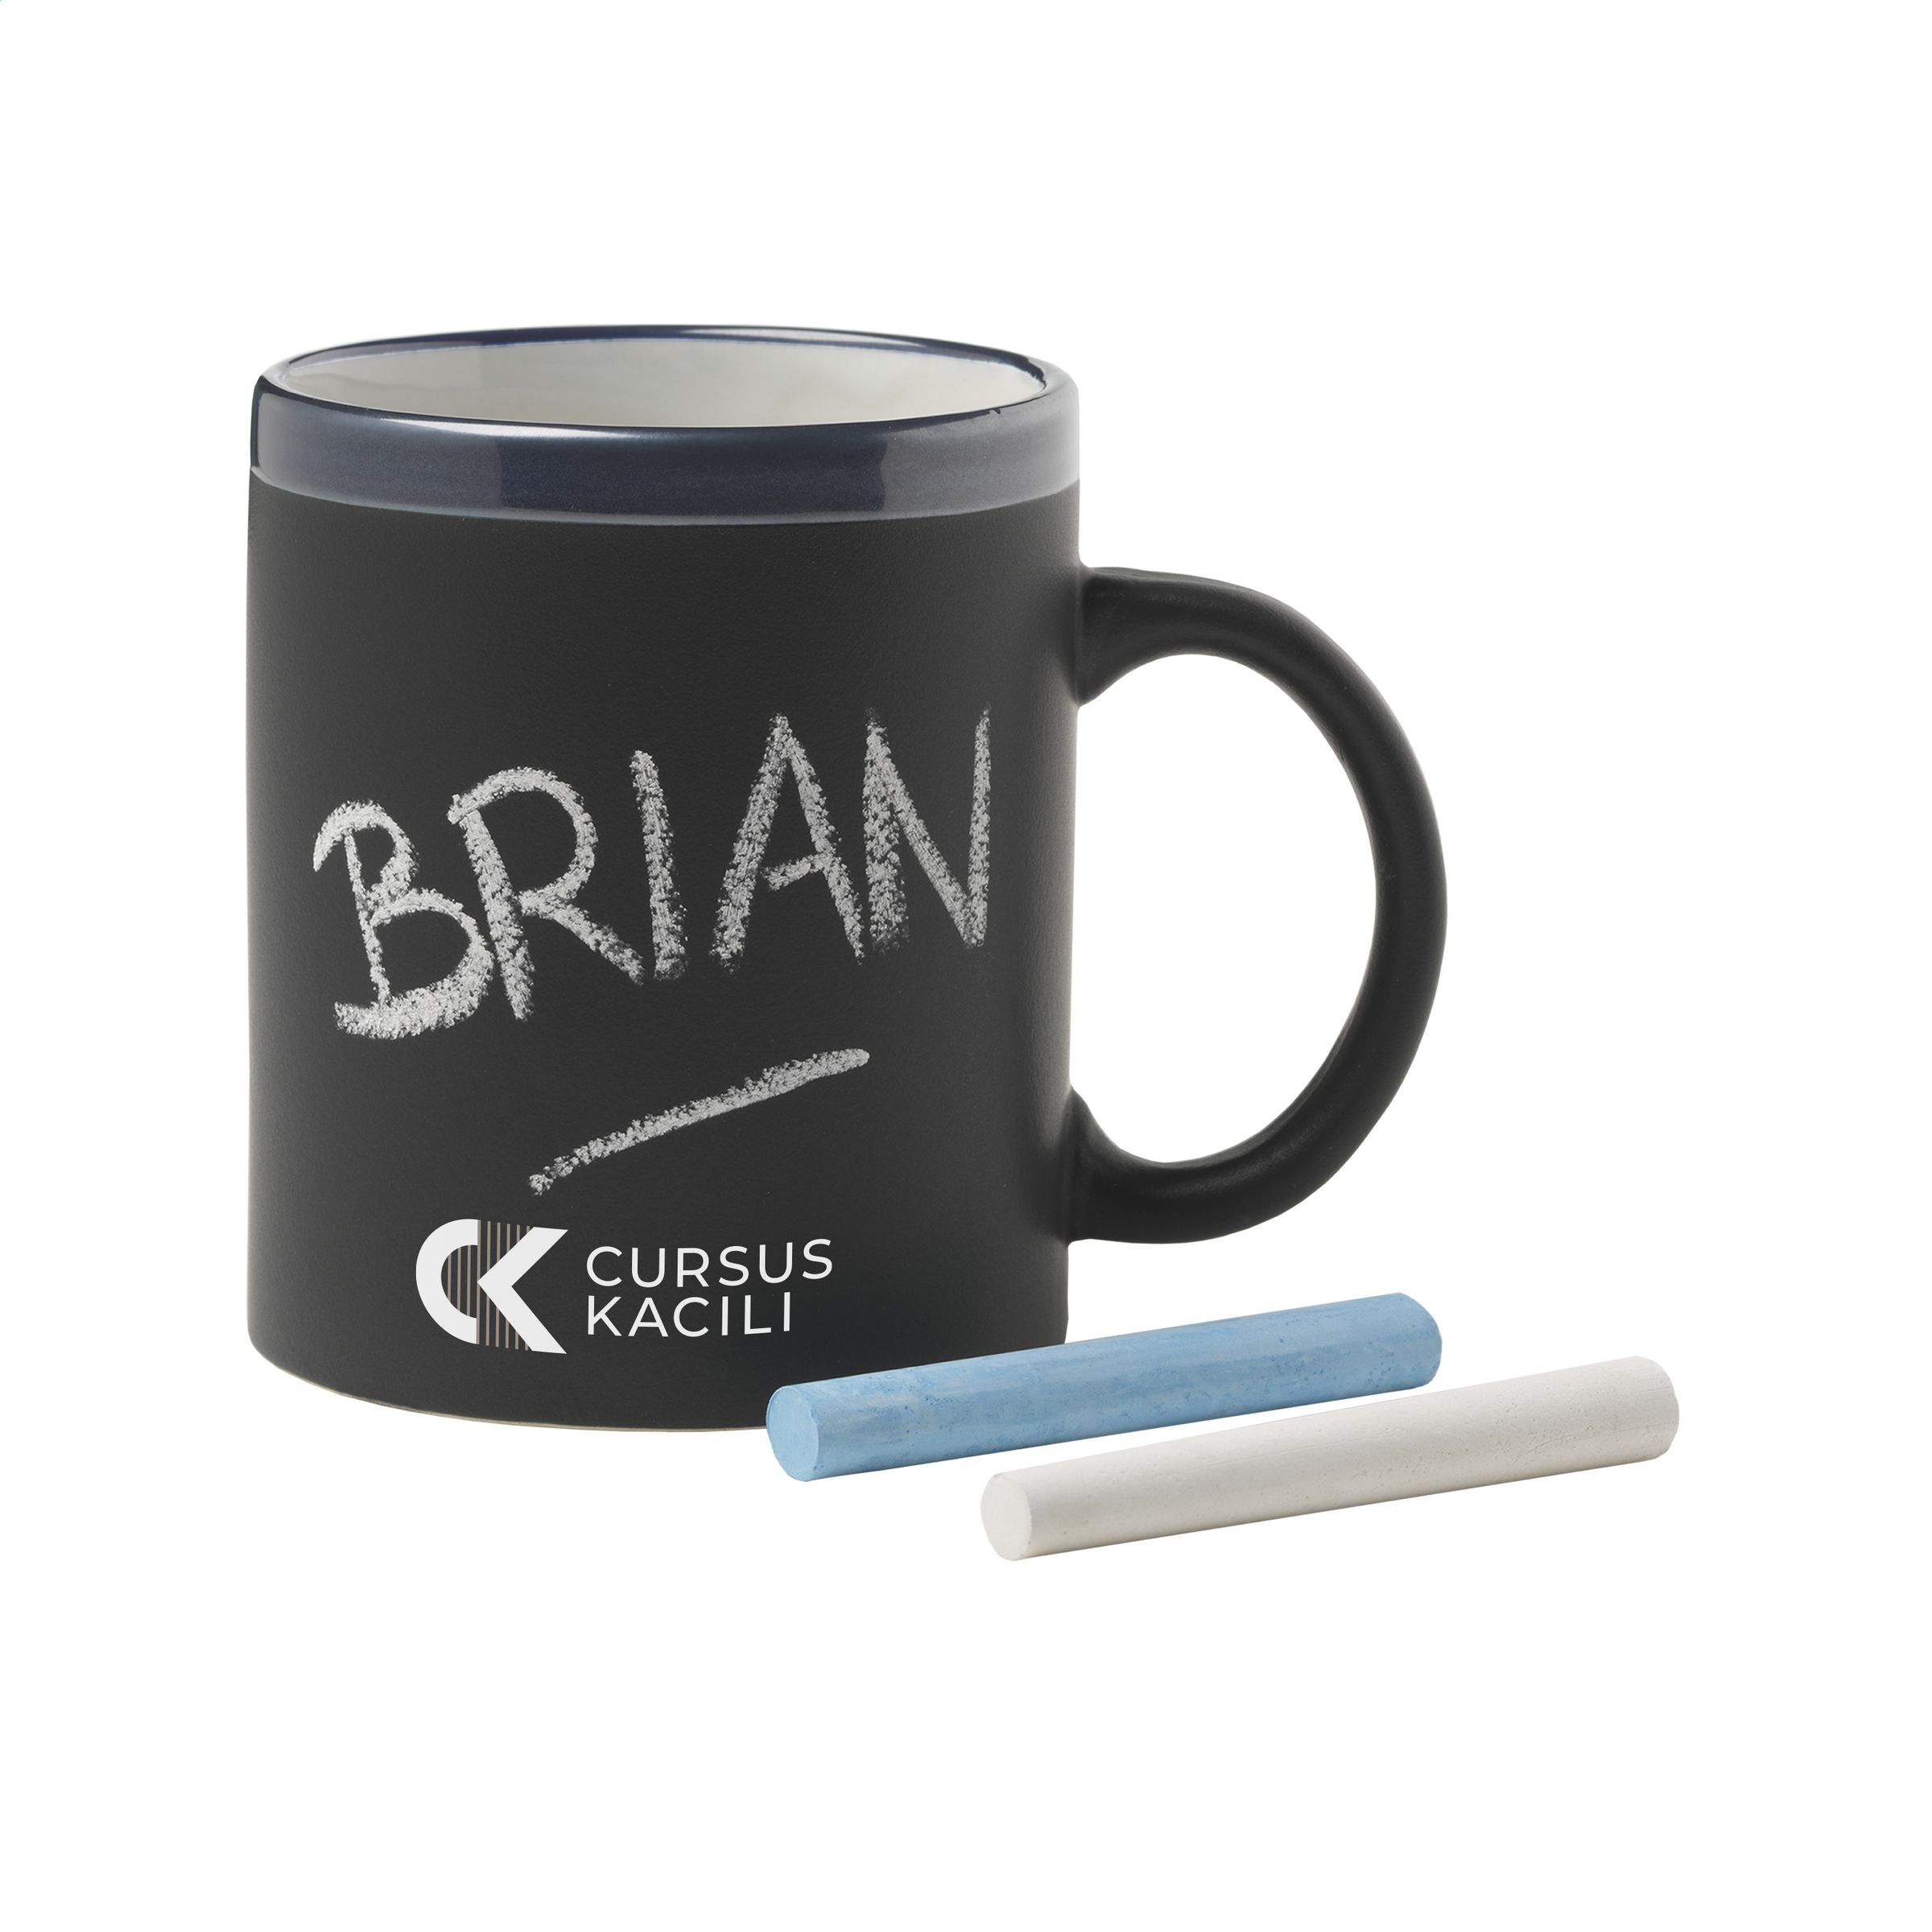 impresión de MyCup mug